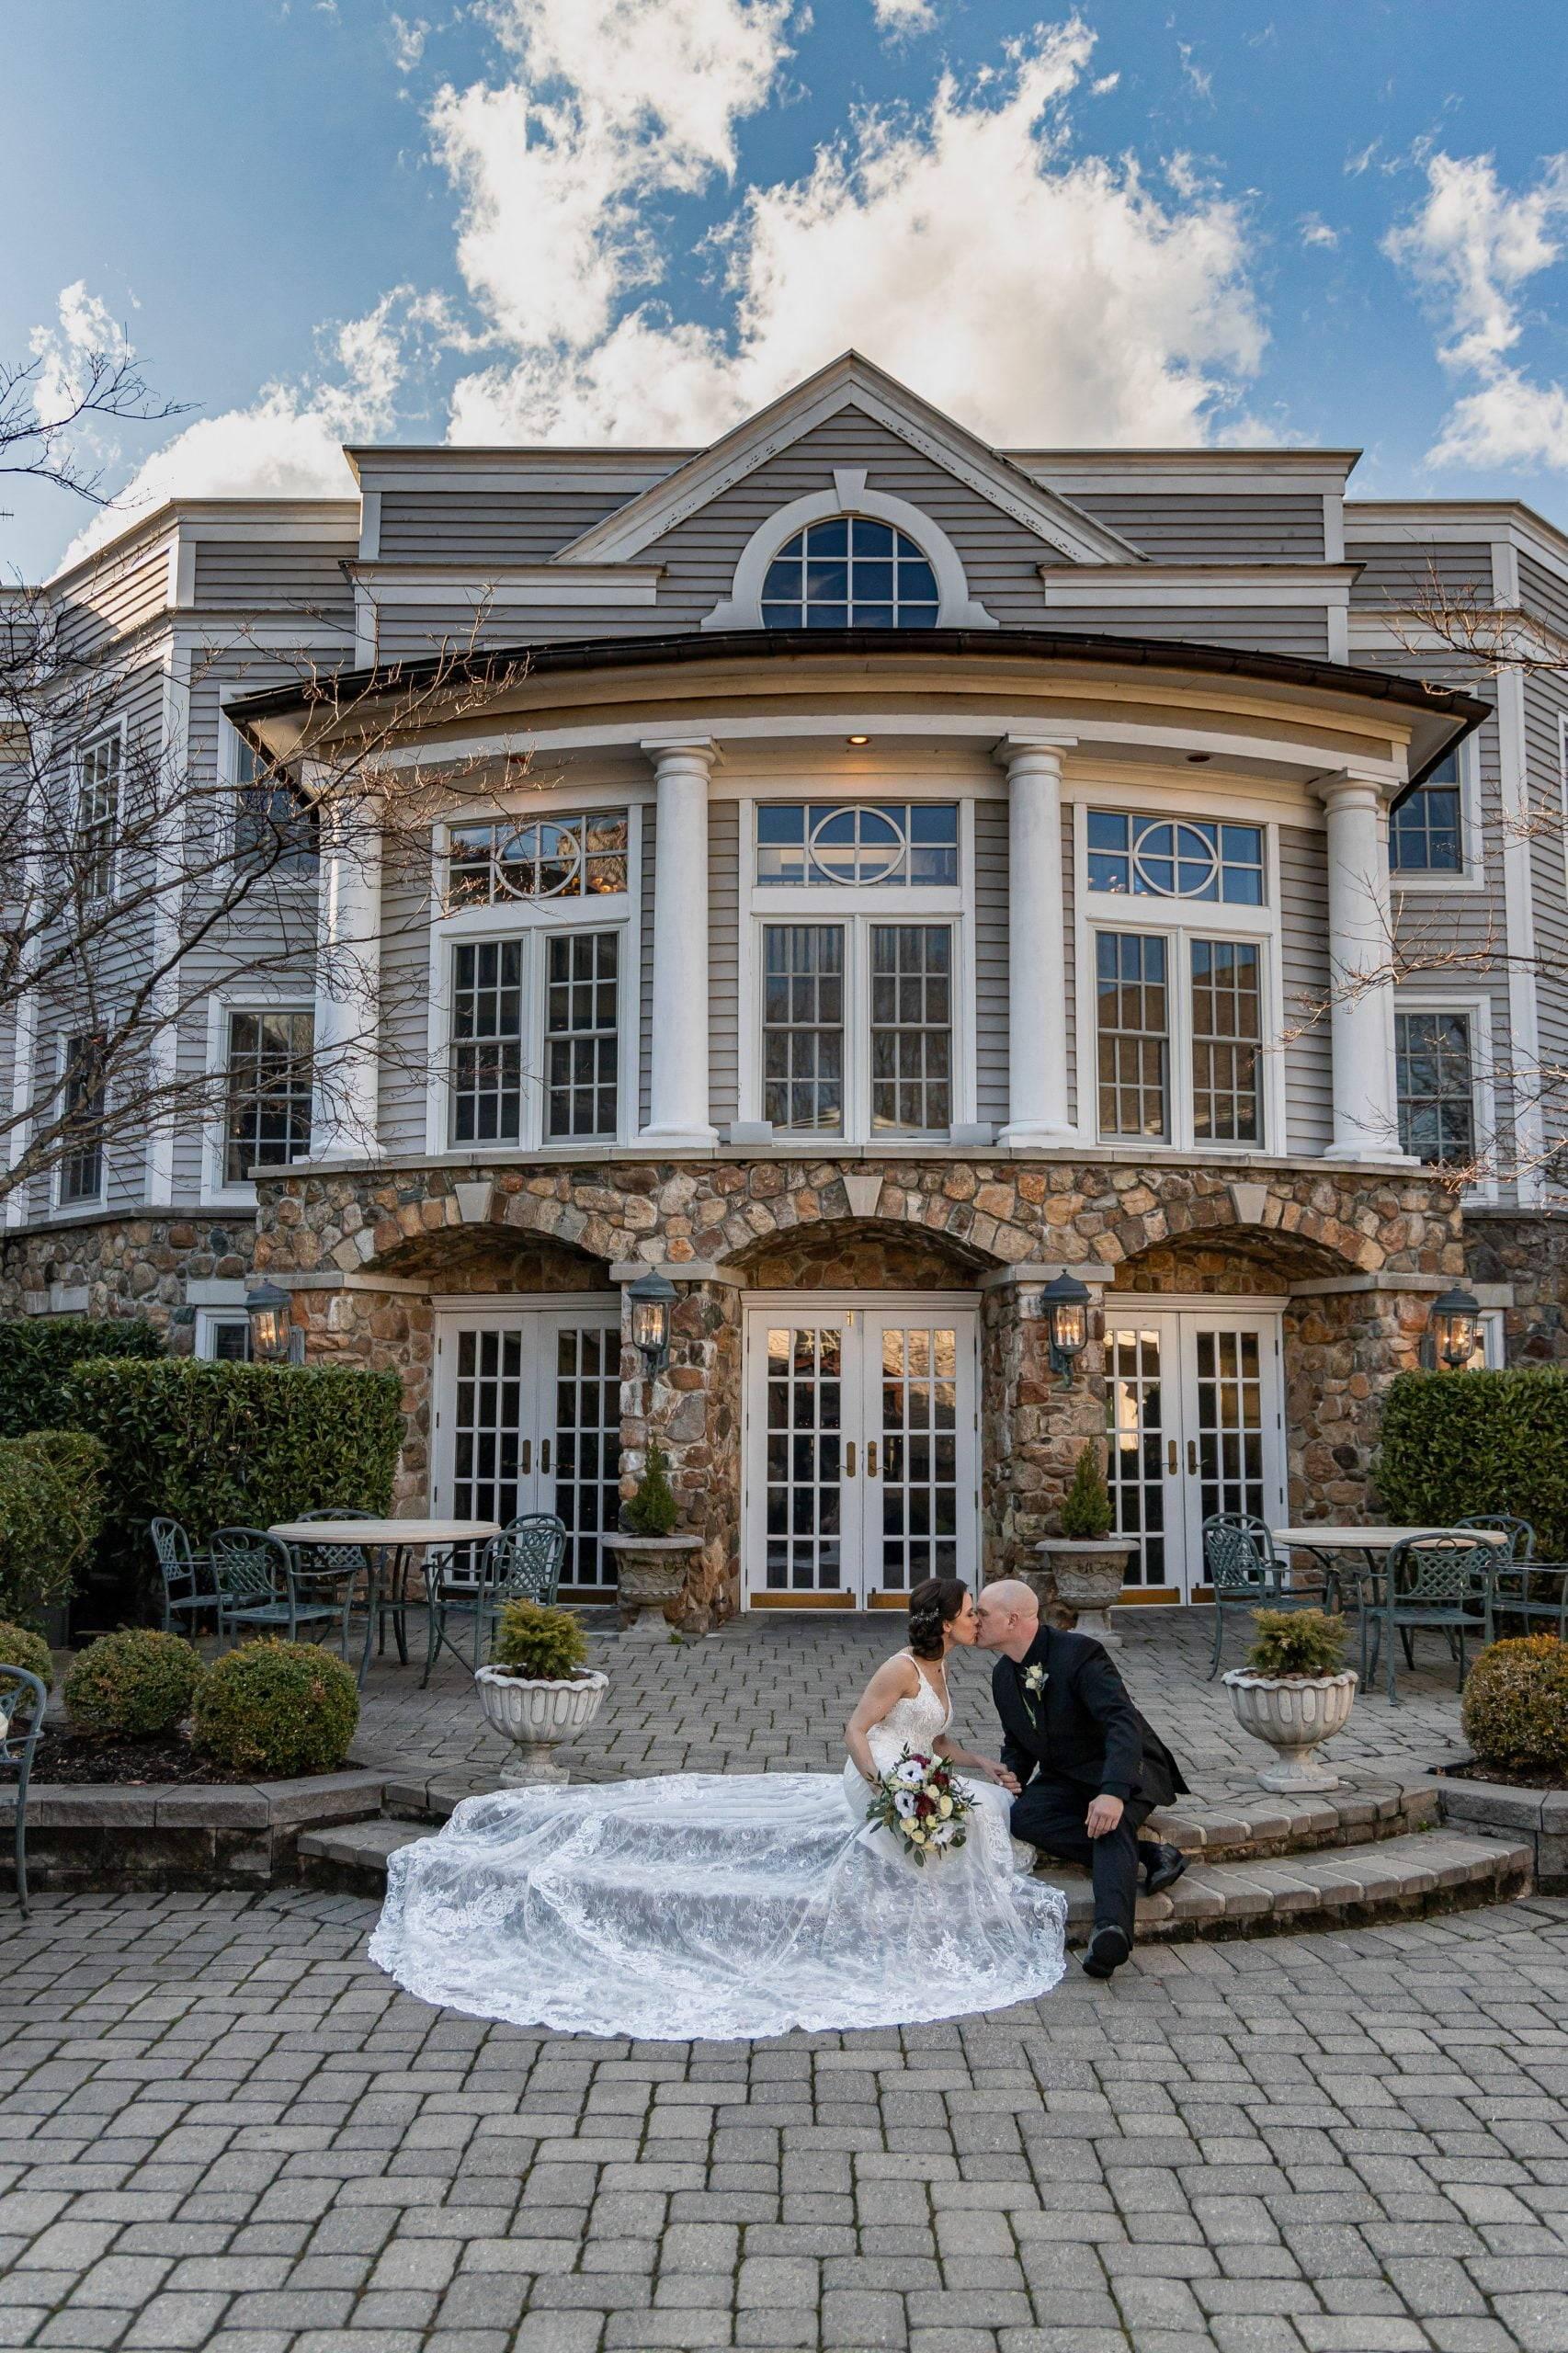 Olde Mill Inn bride and groom kiss on outside steps